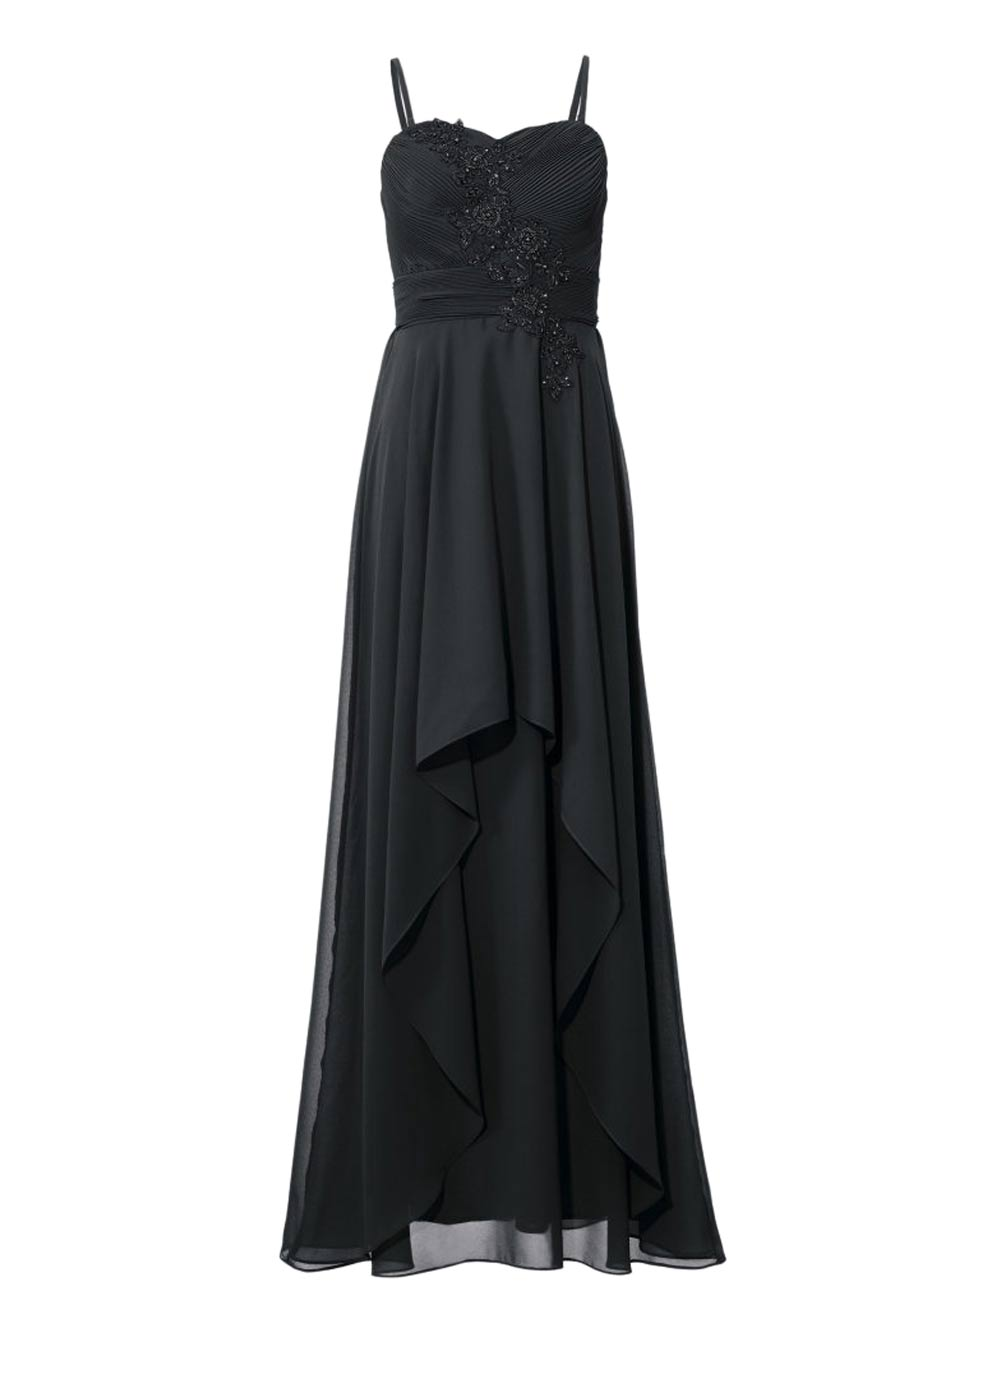 Festmoden Ashley Brooke Abendkleid lang, schwarz 132.868 132.868 Missforty